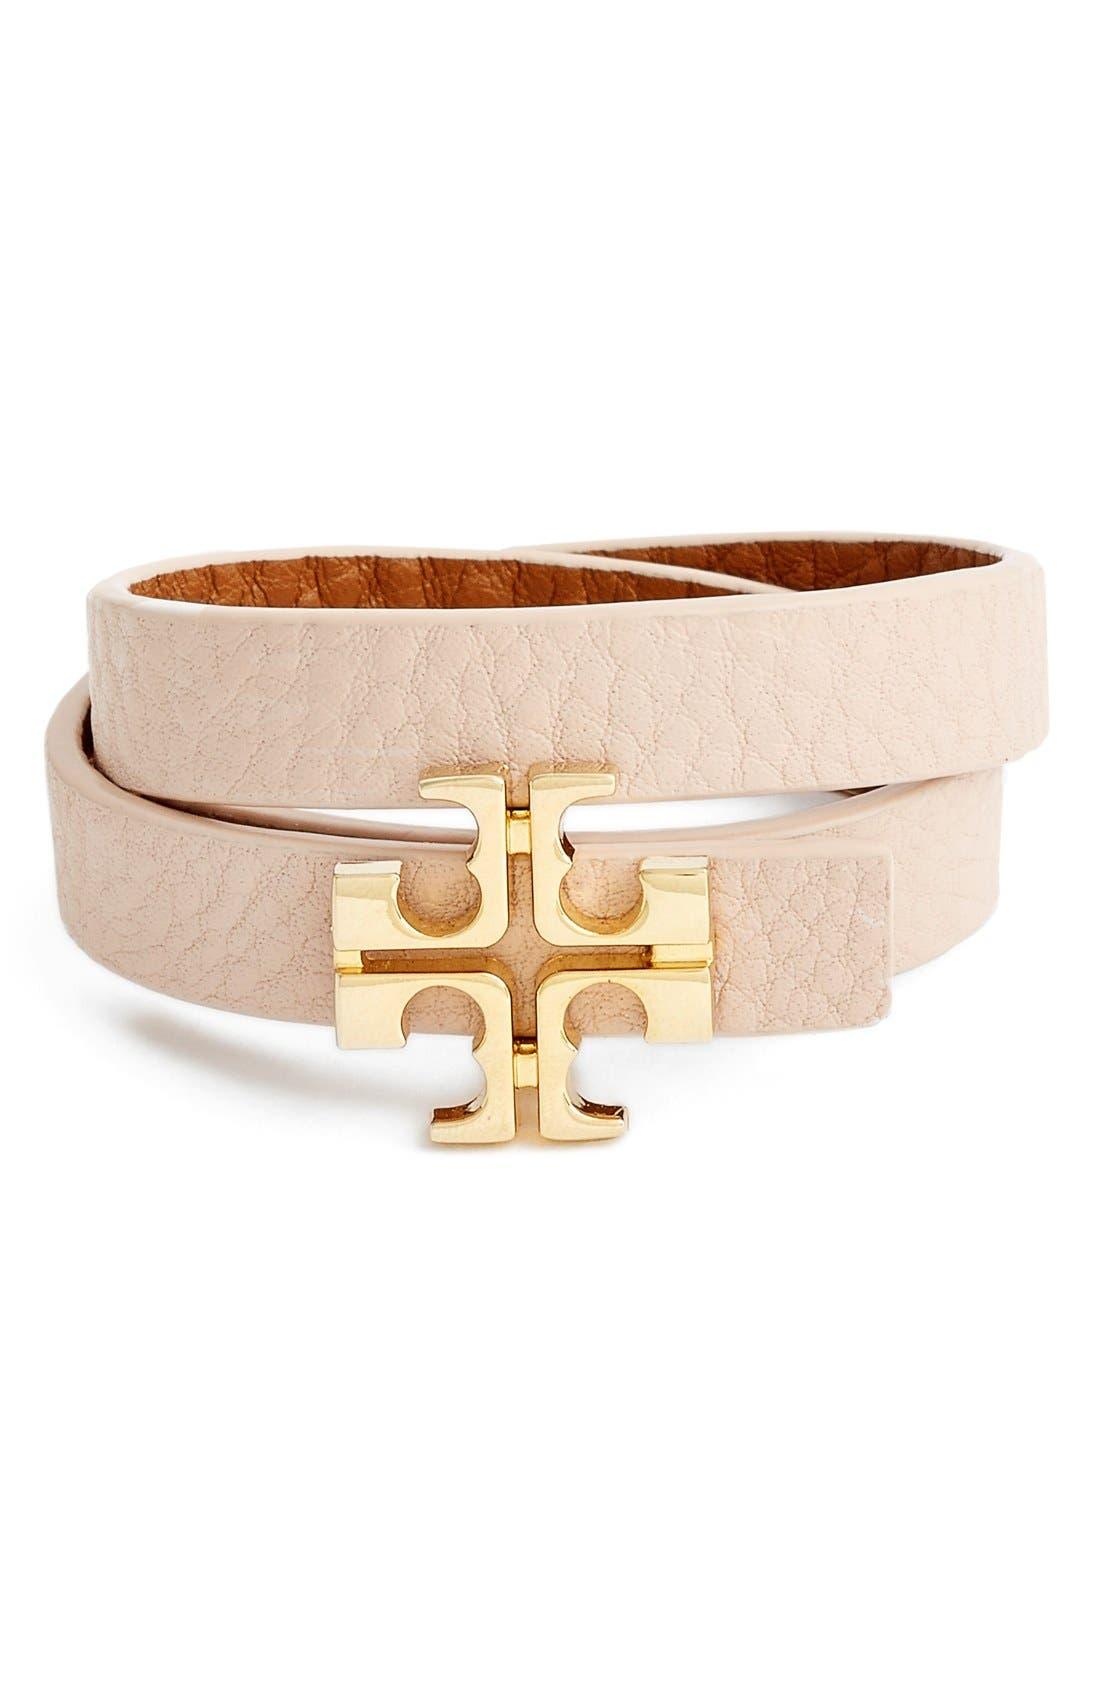 Alternate Image 1 Selected - Tory Burch 'Split T' Reversible Leather Wrap Bracelet